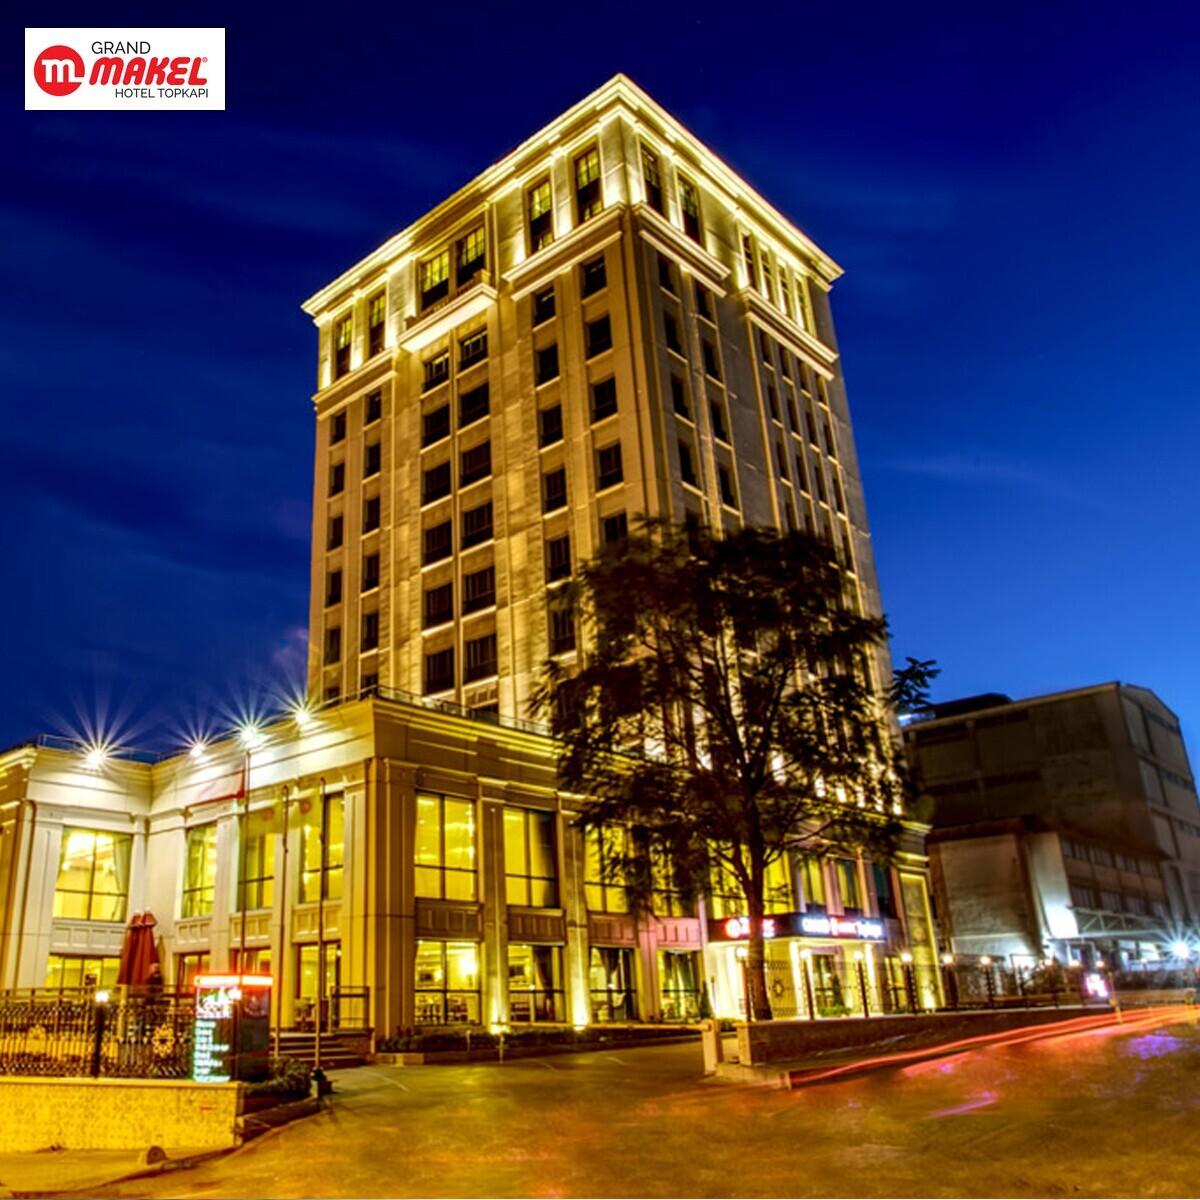 Grand Makel Hotel Gold Spa'da Kese Köpük, Masaj ve Spa Keyfi